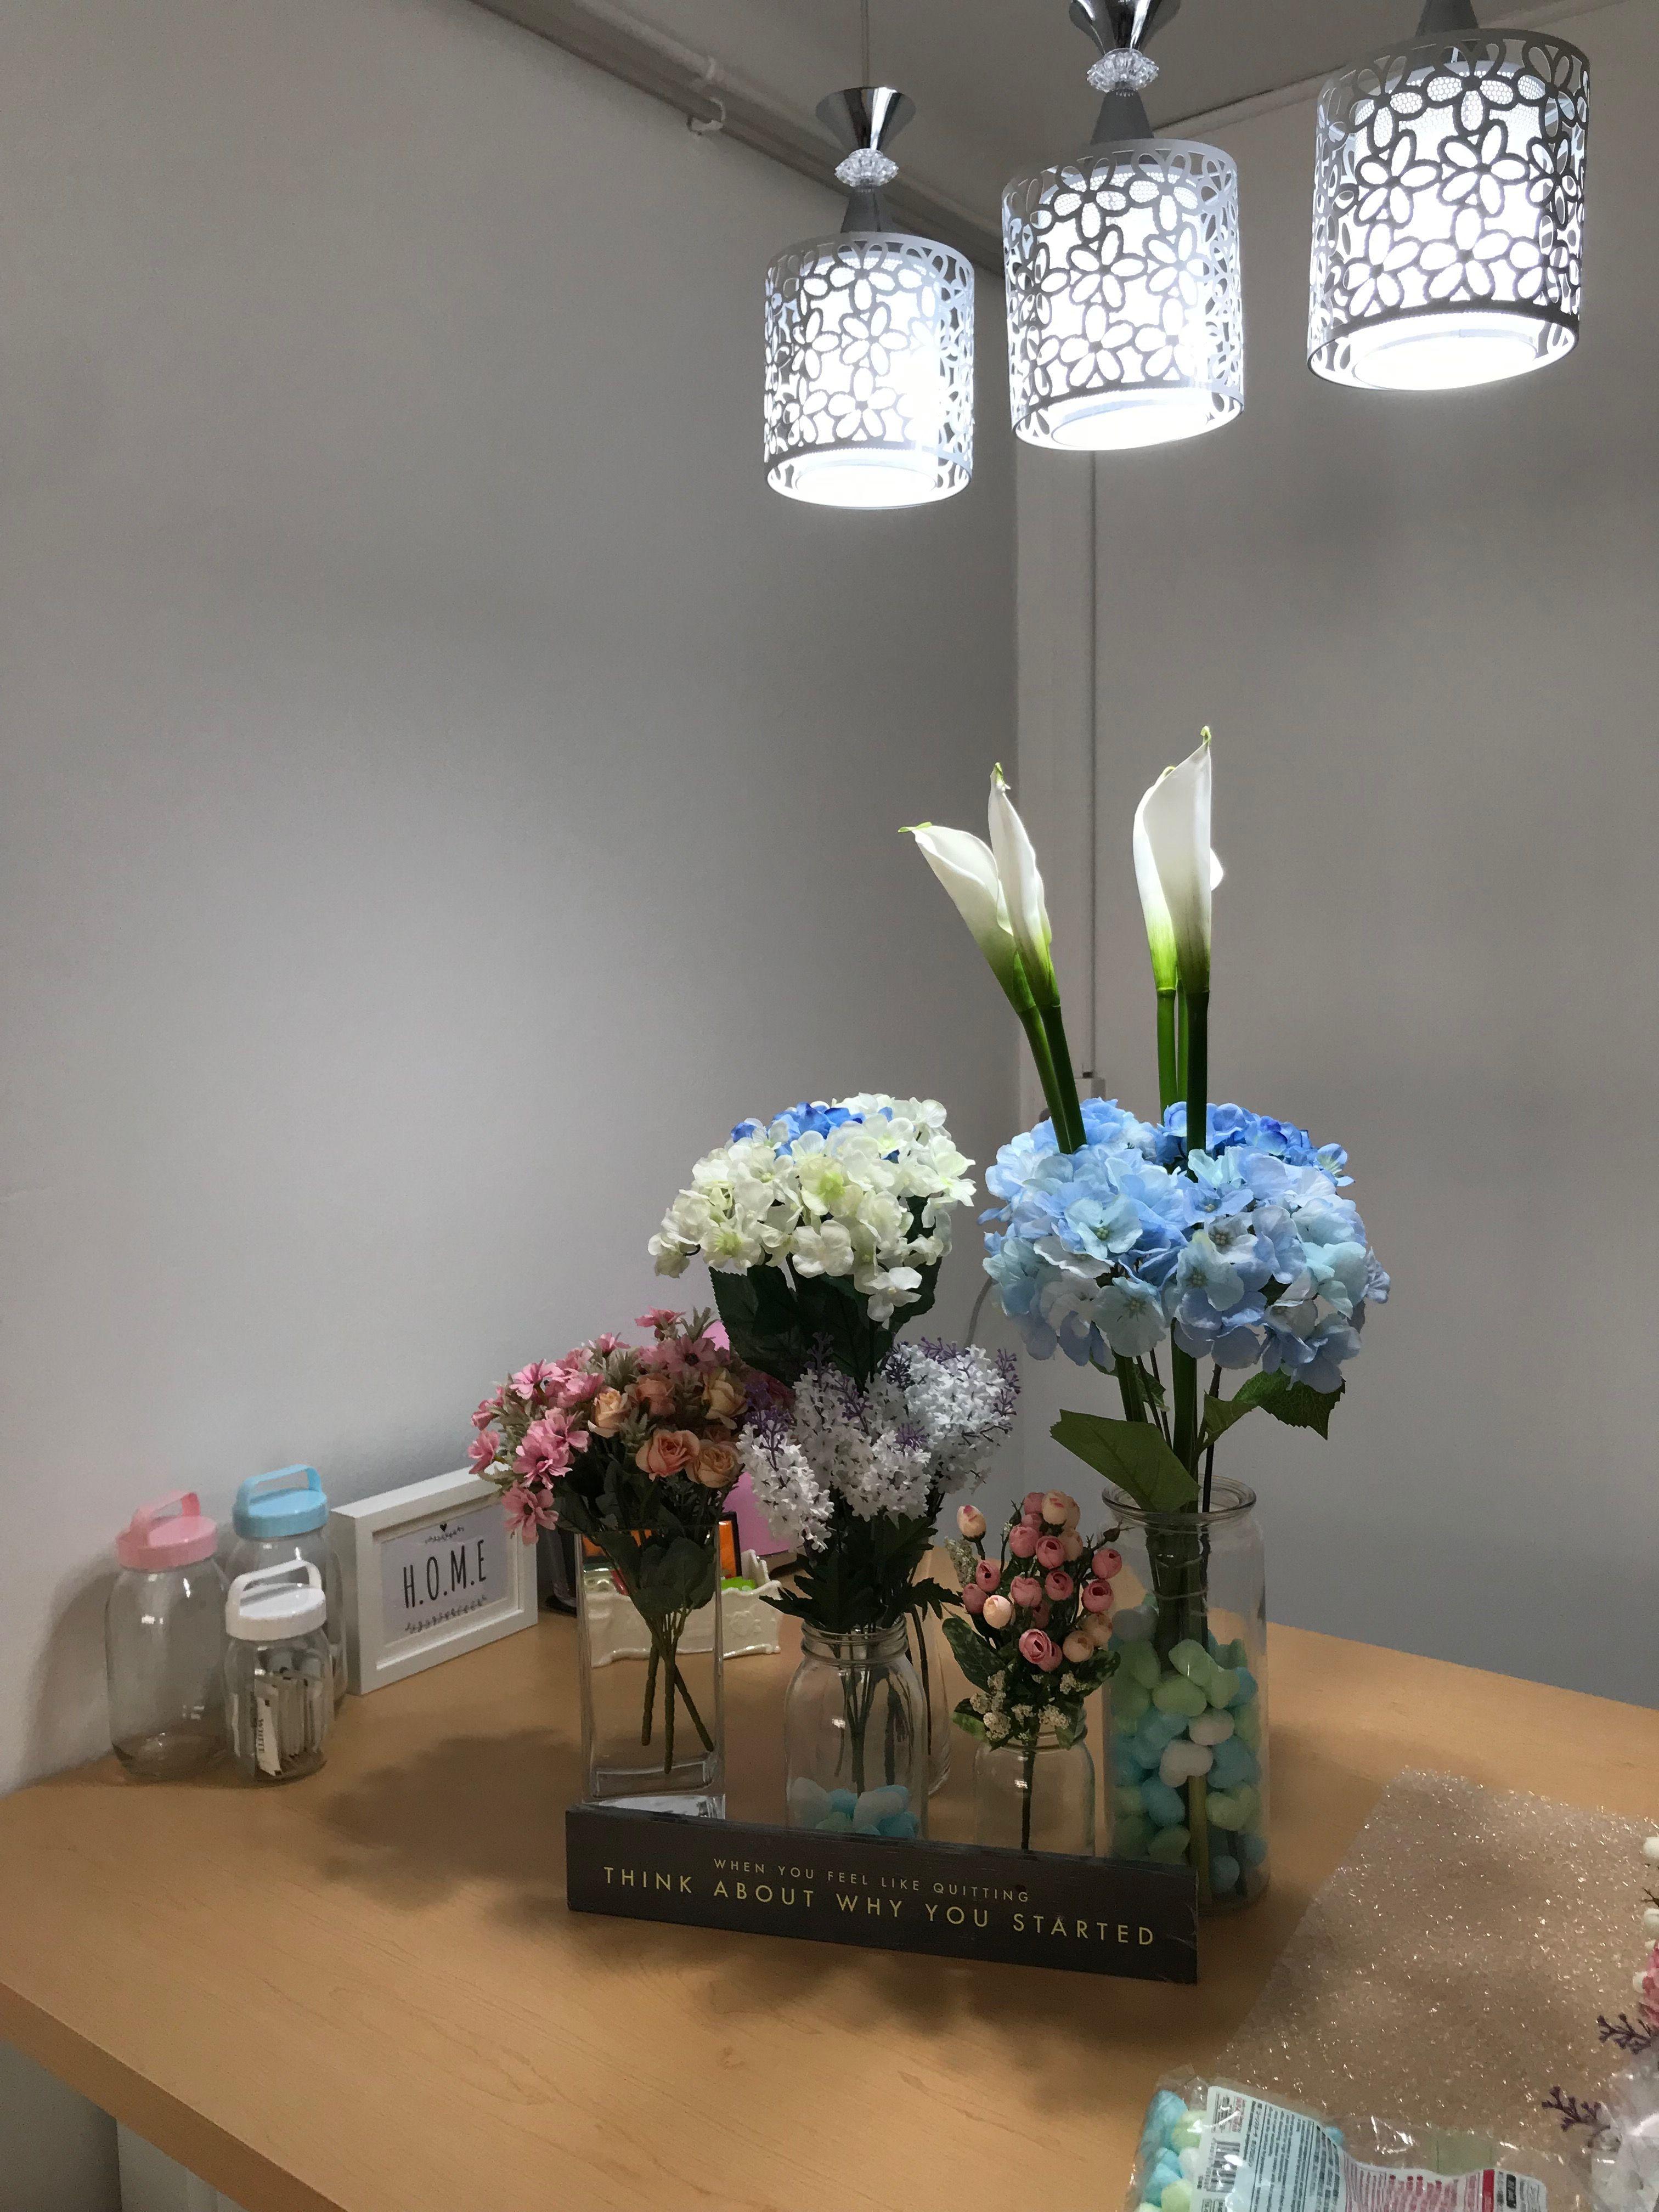 Hdb 3 Room Flat: Glass Vase, Decor, Sweet Home